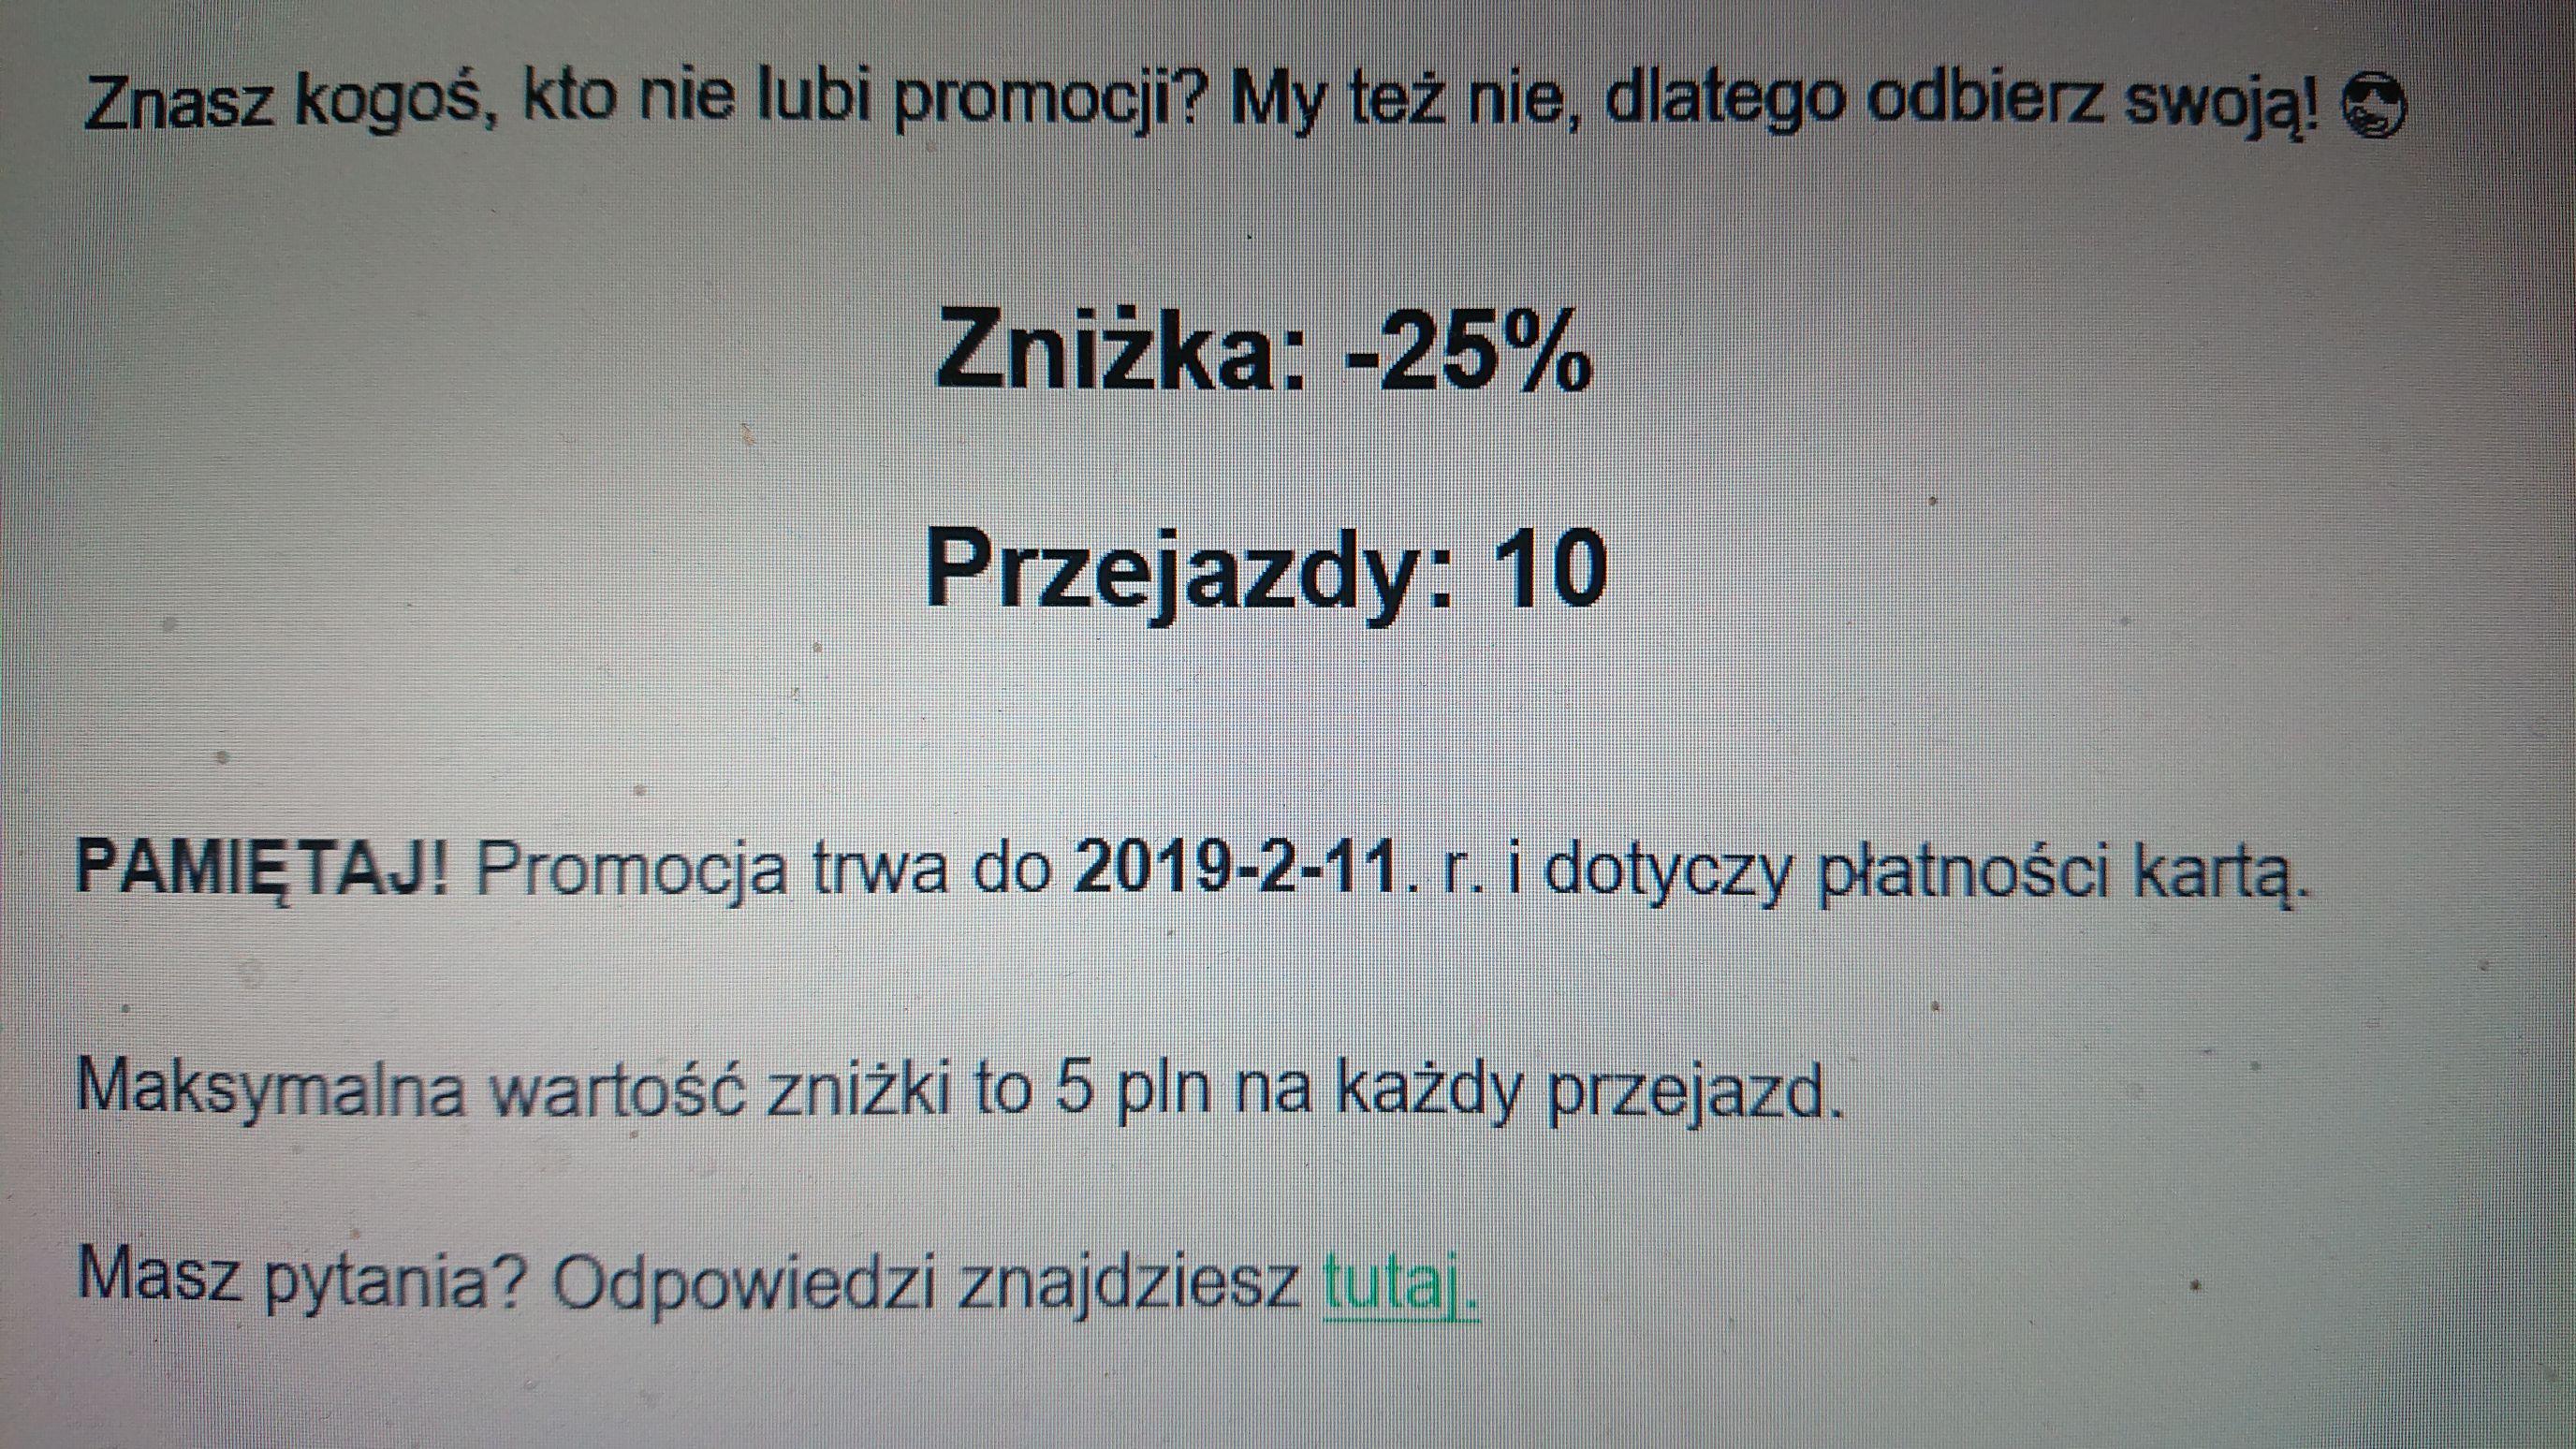 Taxify - 25% max 5 zł